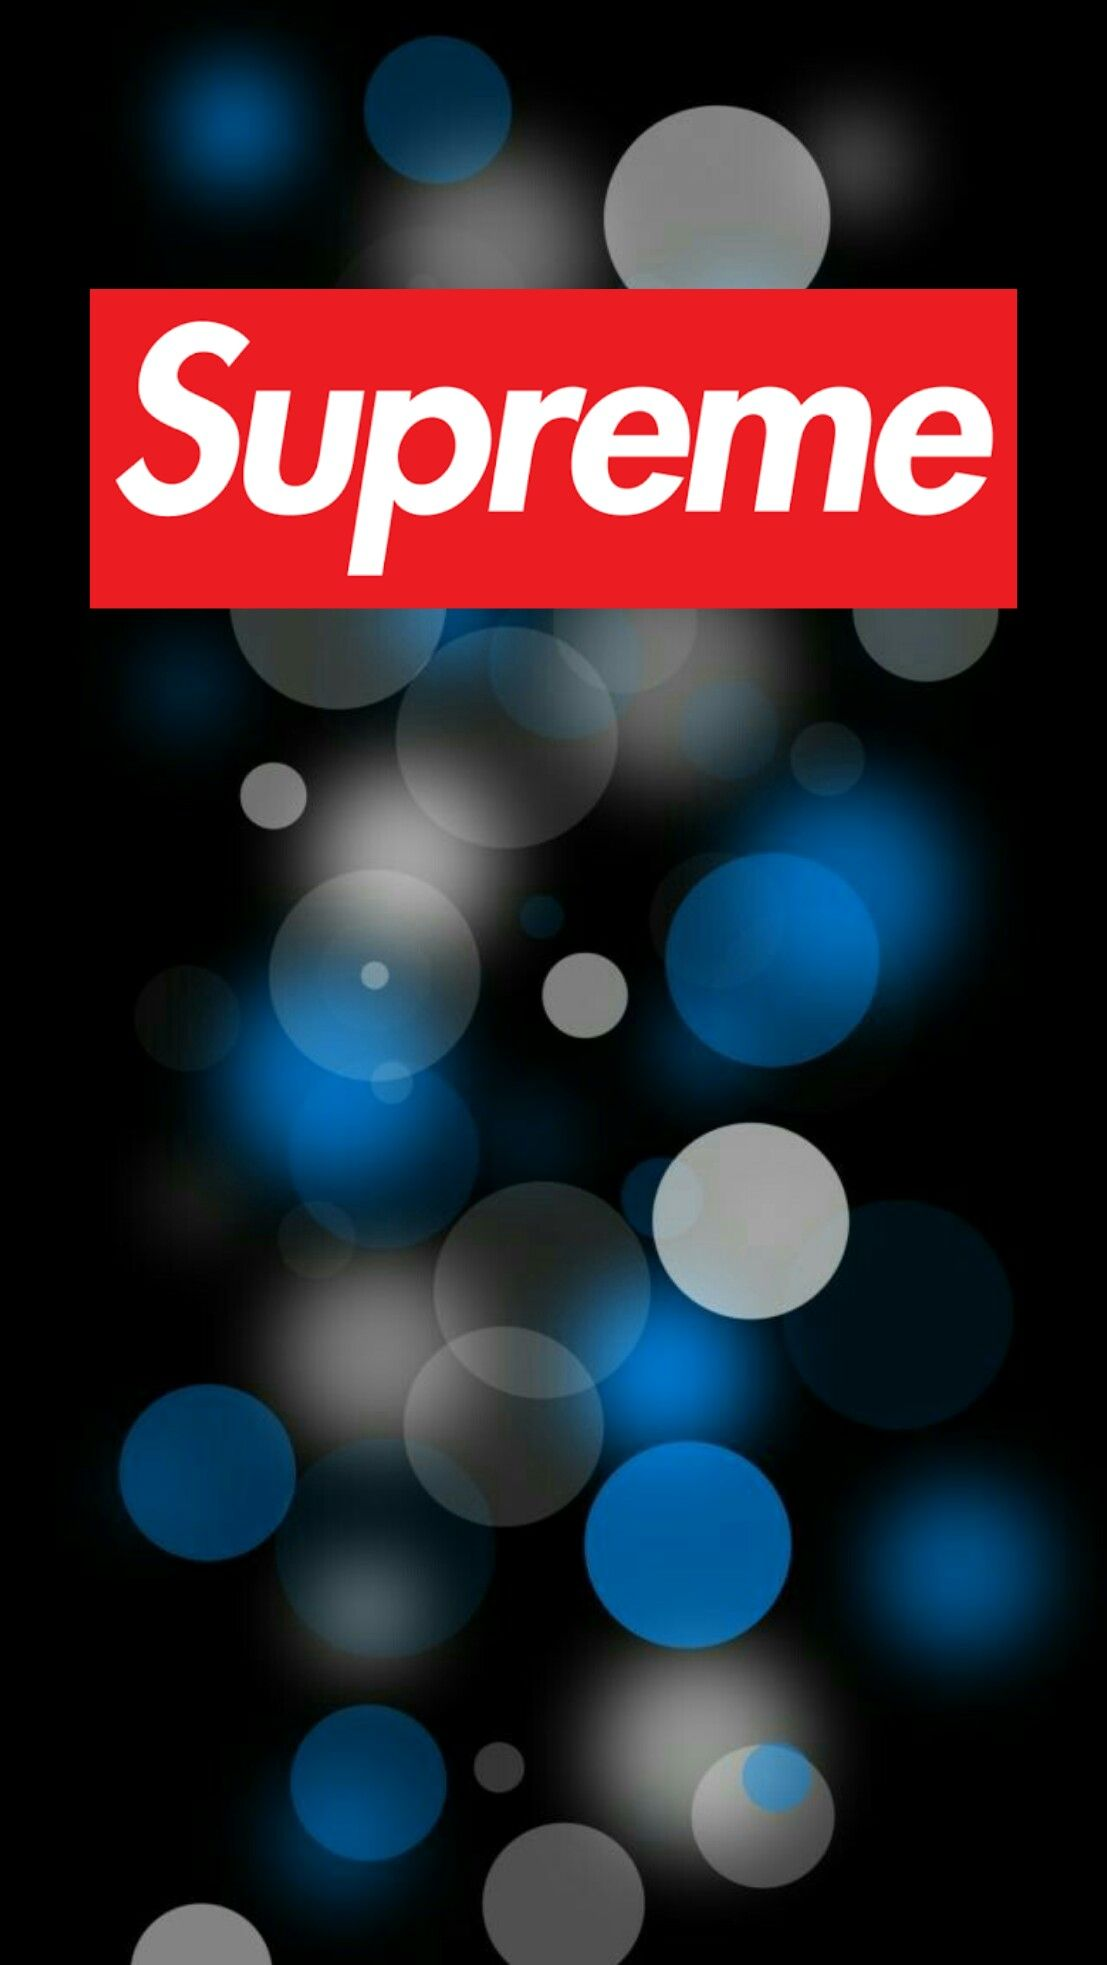 Popular Wallpaper Naruto Supreme - feeeb1bf6cd67890fd8b976d52cccf24  Photograph.jpg